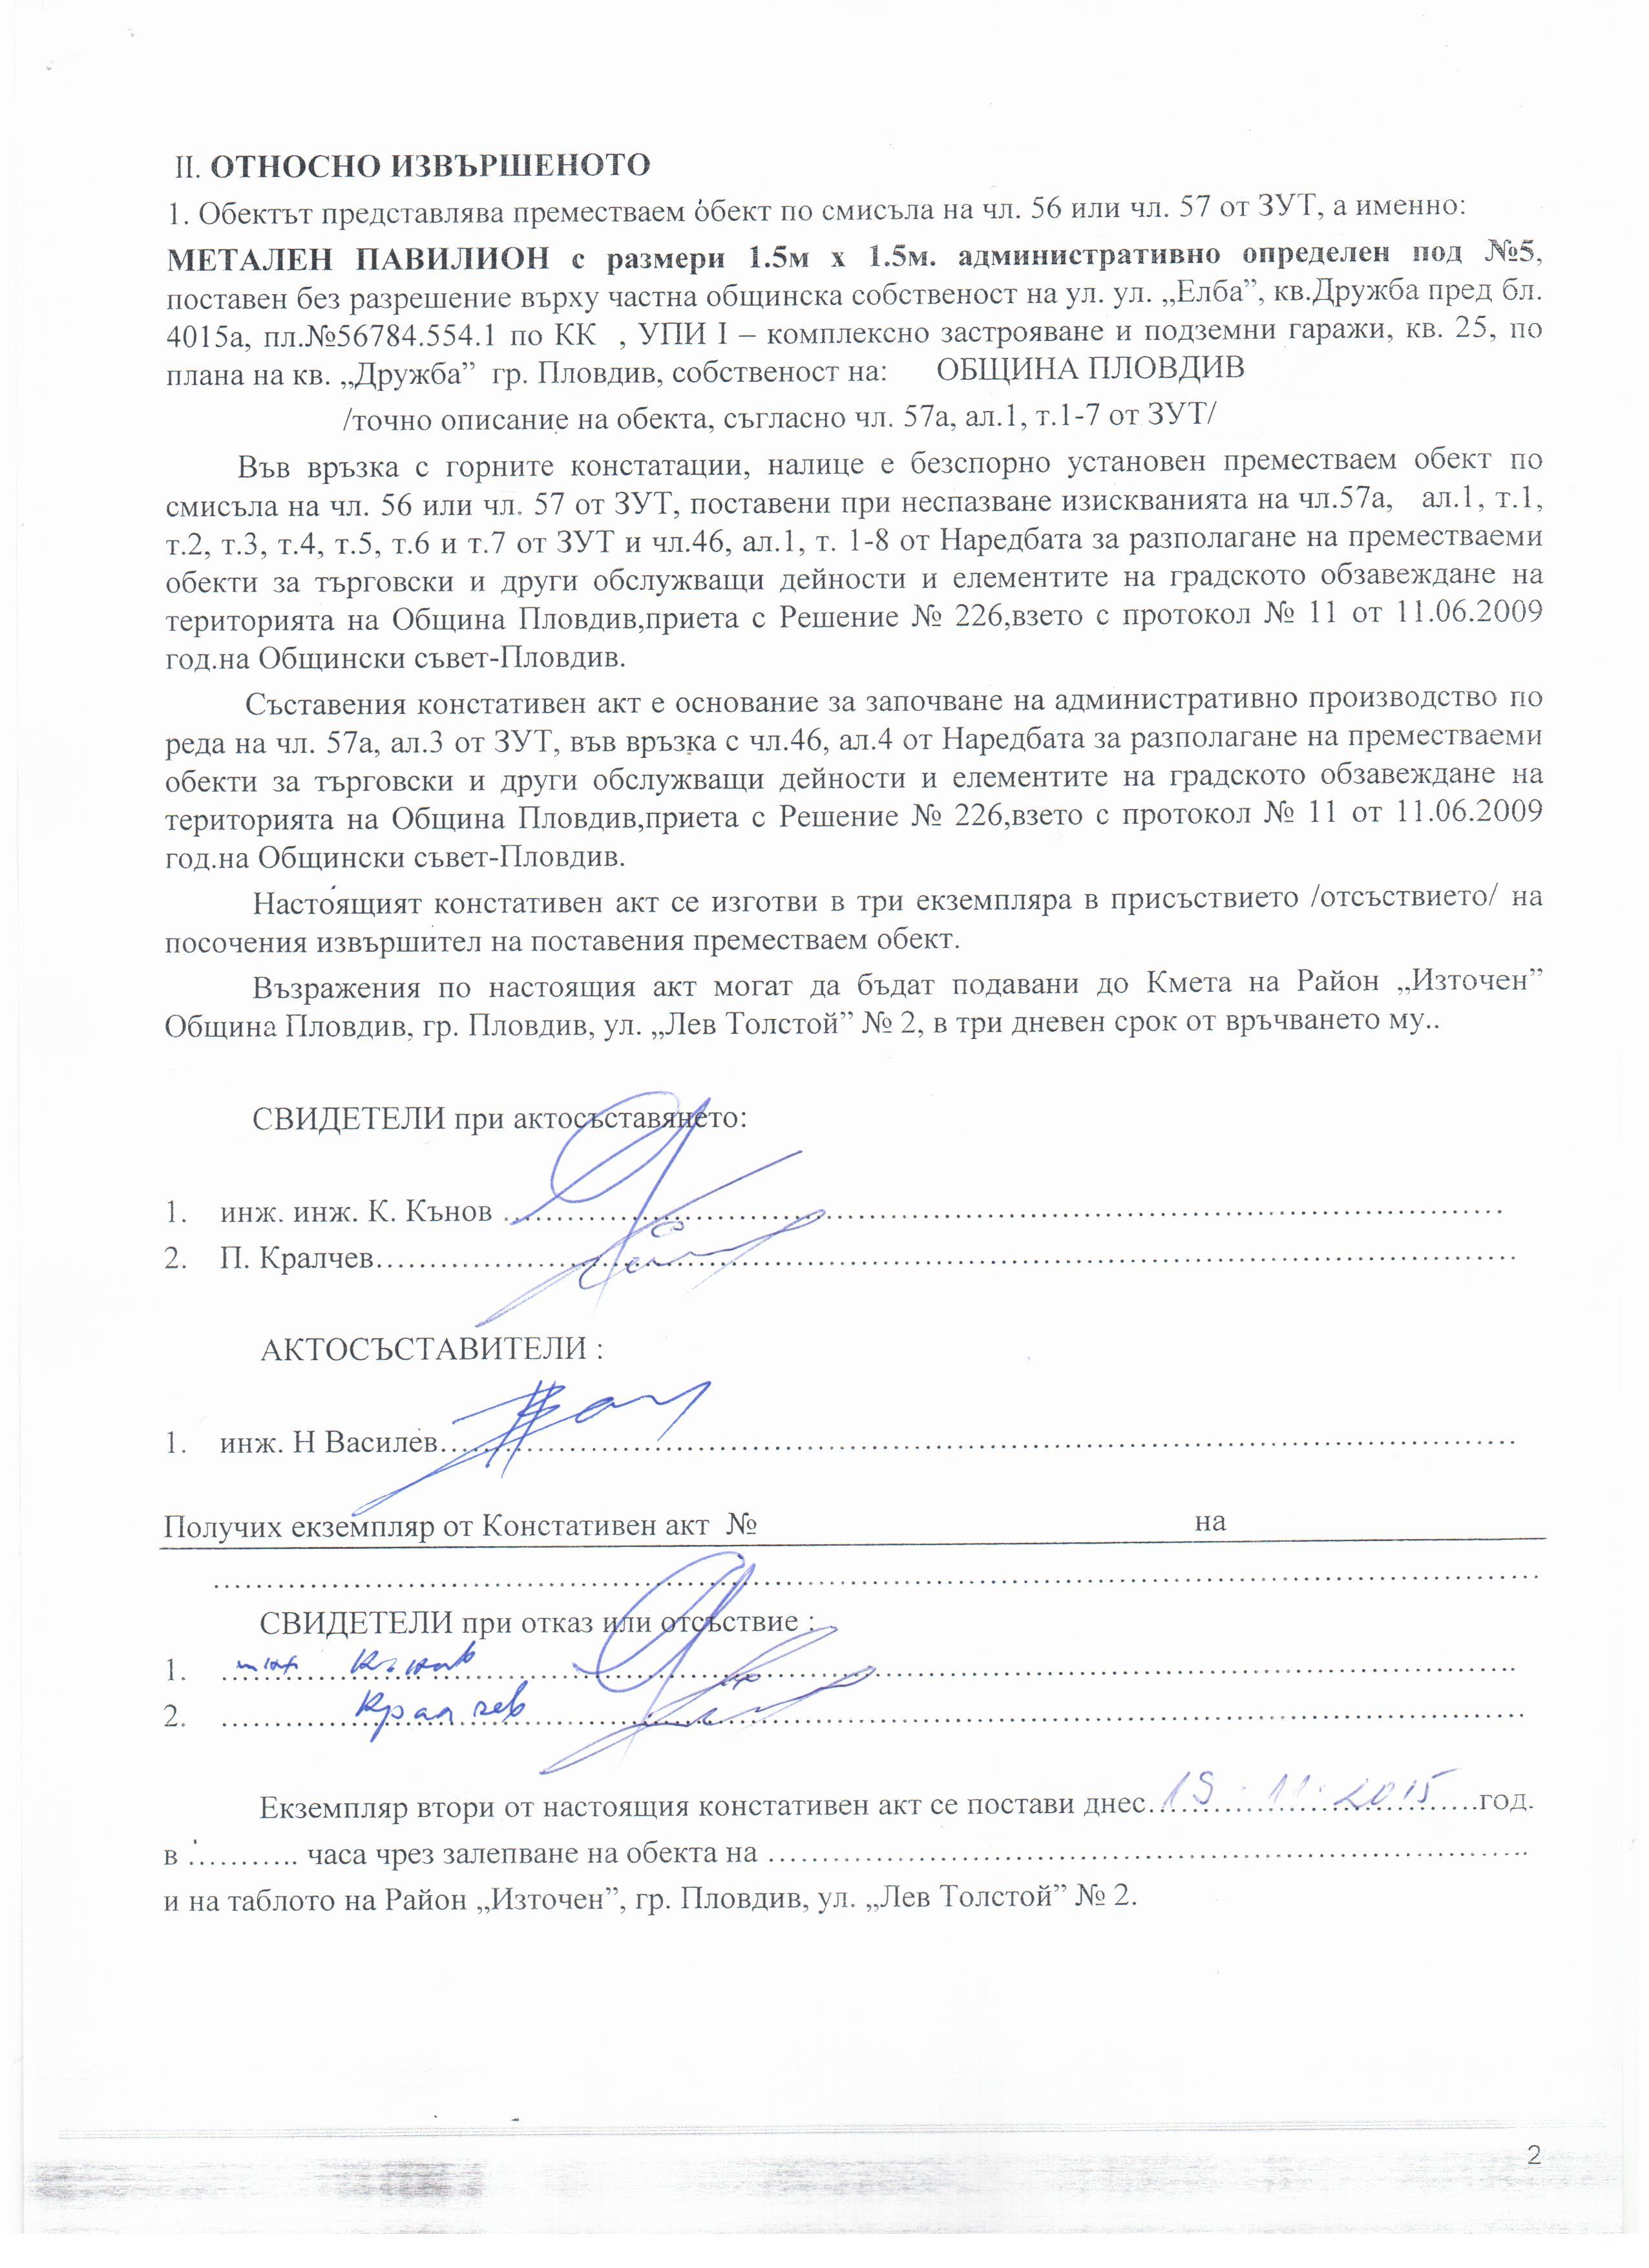 KONSTATIVEN_AKT_№80_1